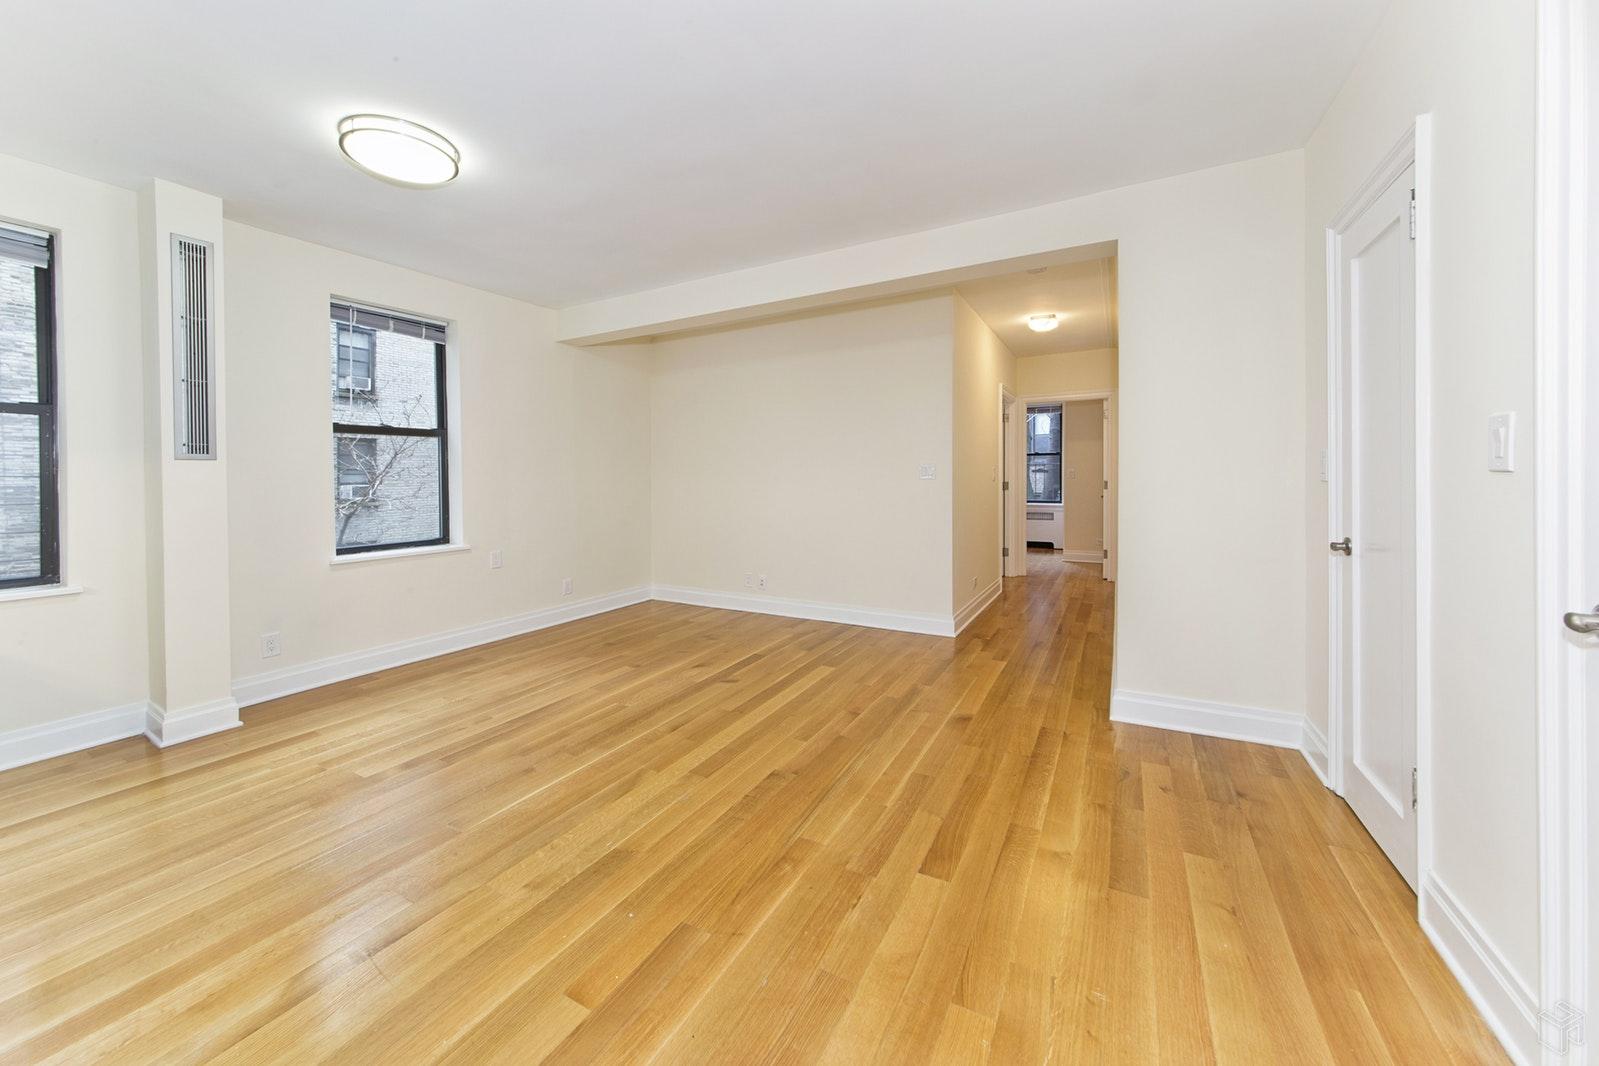 120 EAST 89TH STREET 3A, Upper East Side, $3,500, Web #: 19385959